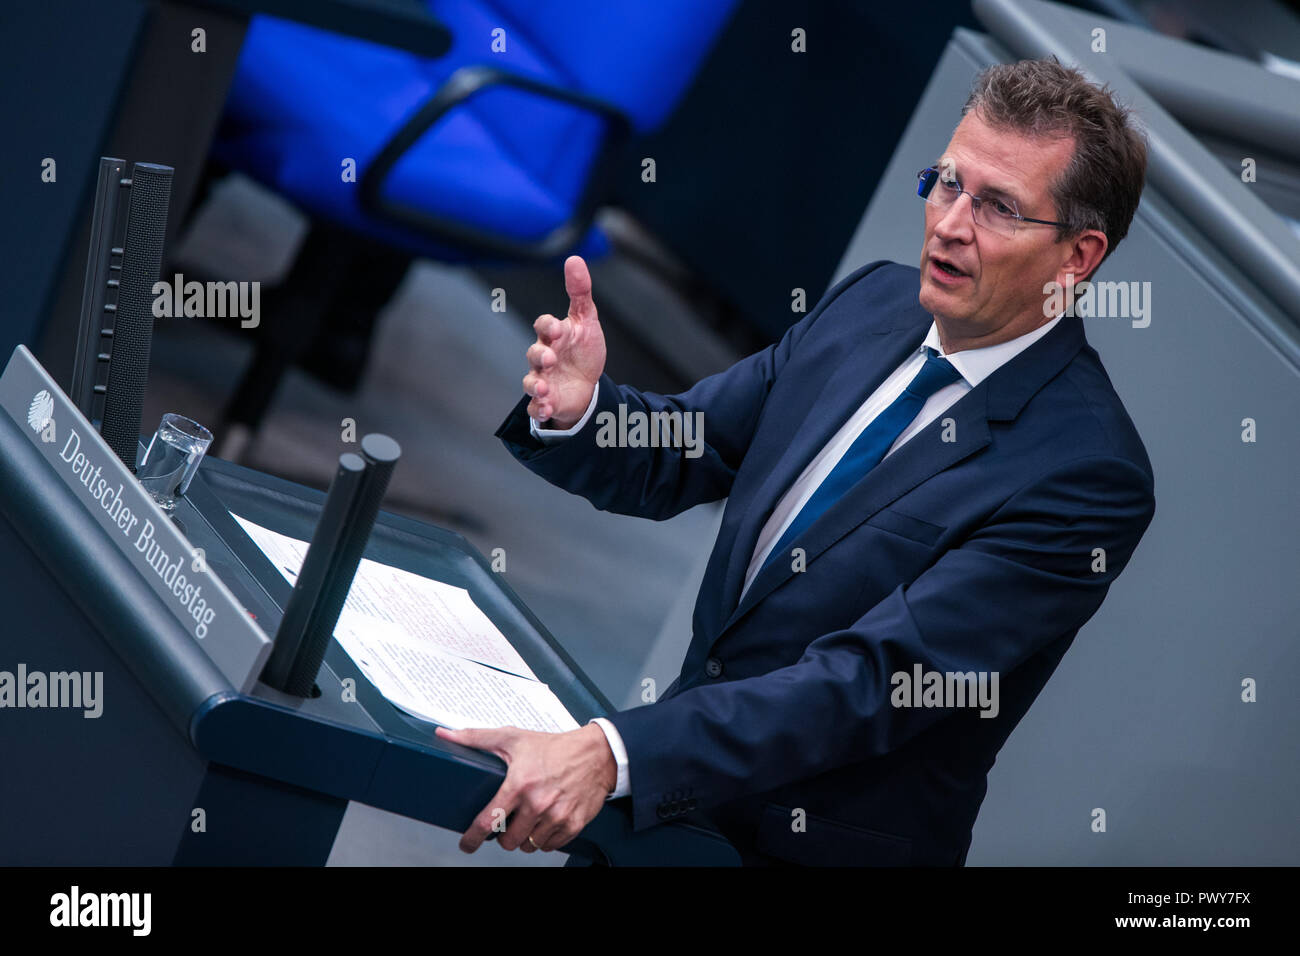 Berlin, Germany. 18th Oct, 2018. Ralf Brauksiepe, member of the Bundestag of the CDU/CSU parliamentary group, speaks in the Bundestag. Credit: Jens Büttner/dpa-Zentralbild/dpa/Alamy Live News - Stock Image